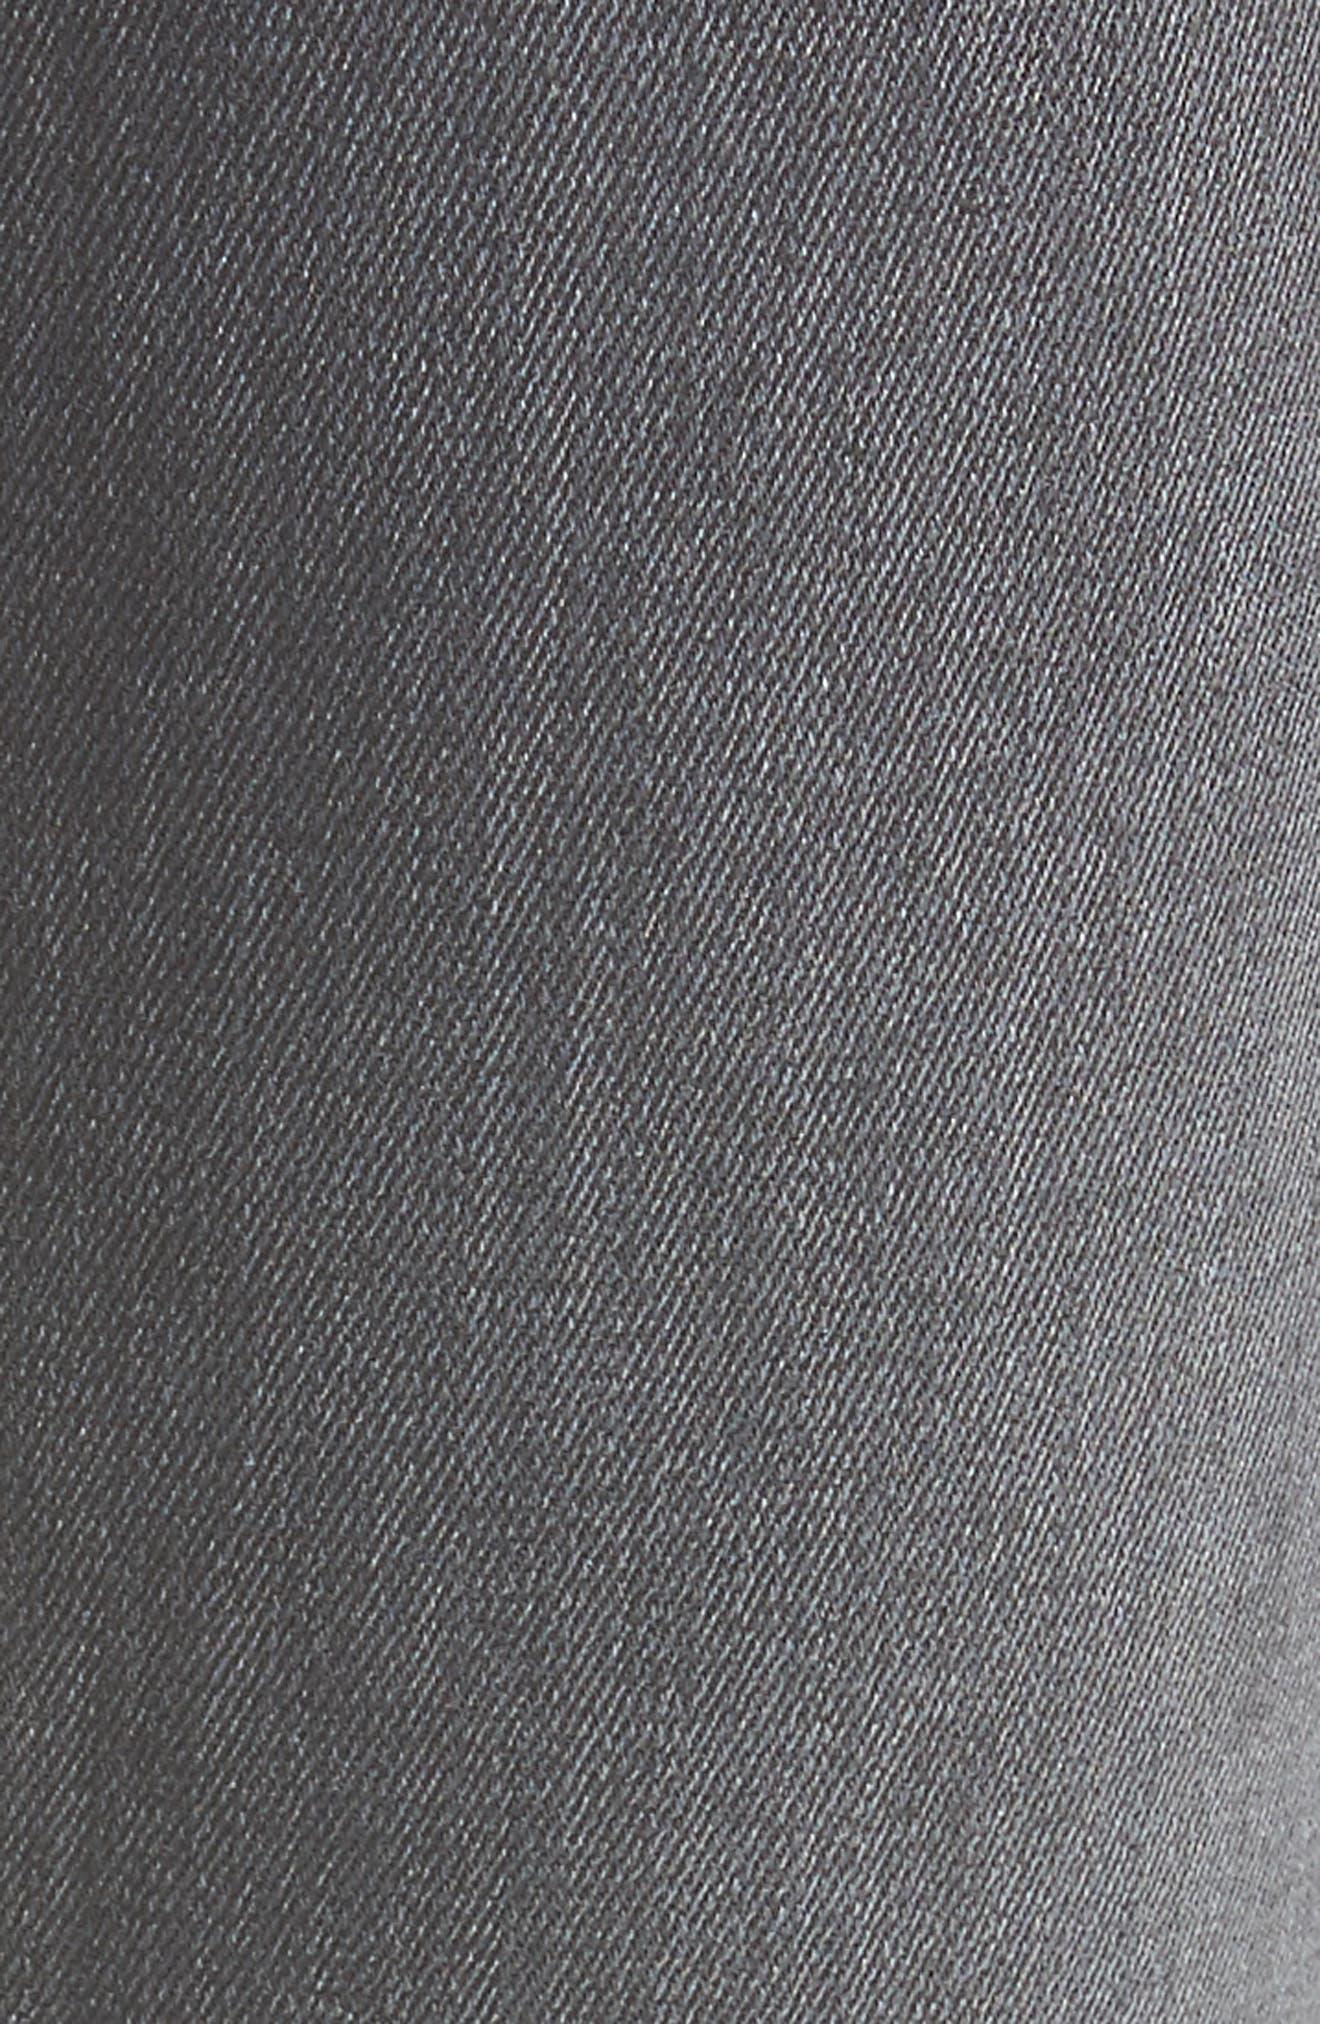 Alternate Image 5  - DL1961 Emma Power Legging Jeans (Seneca)